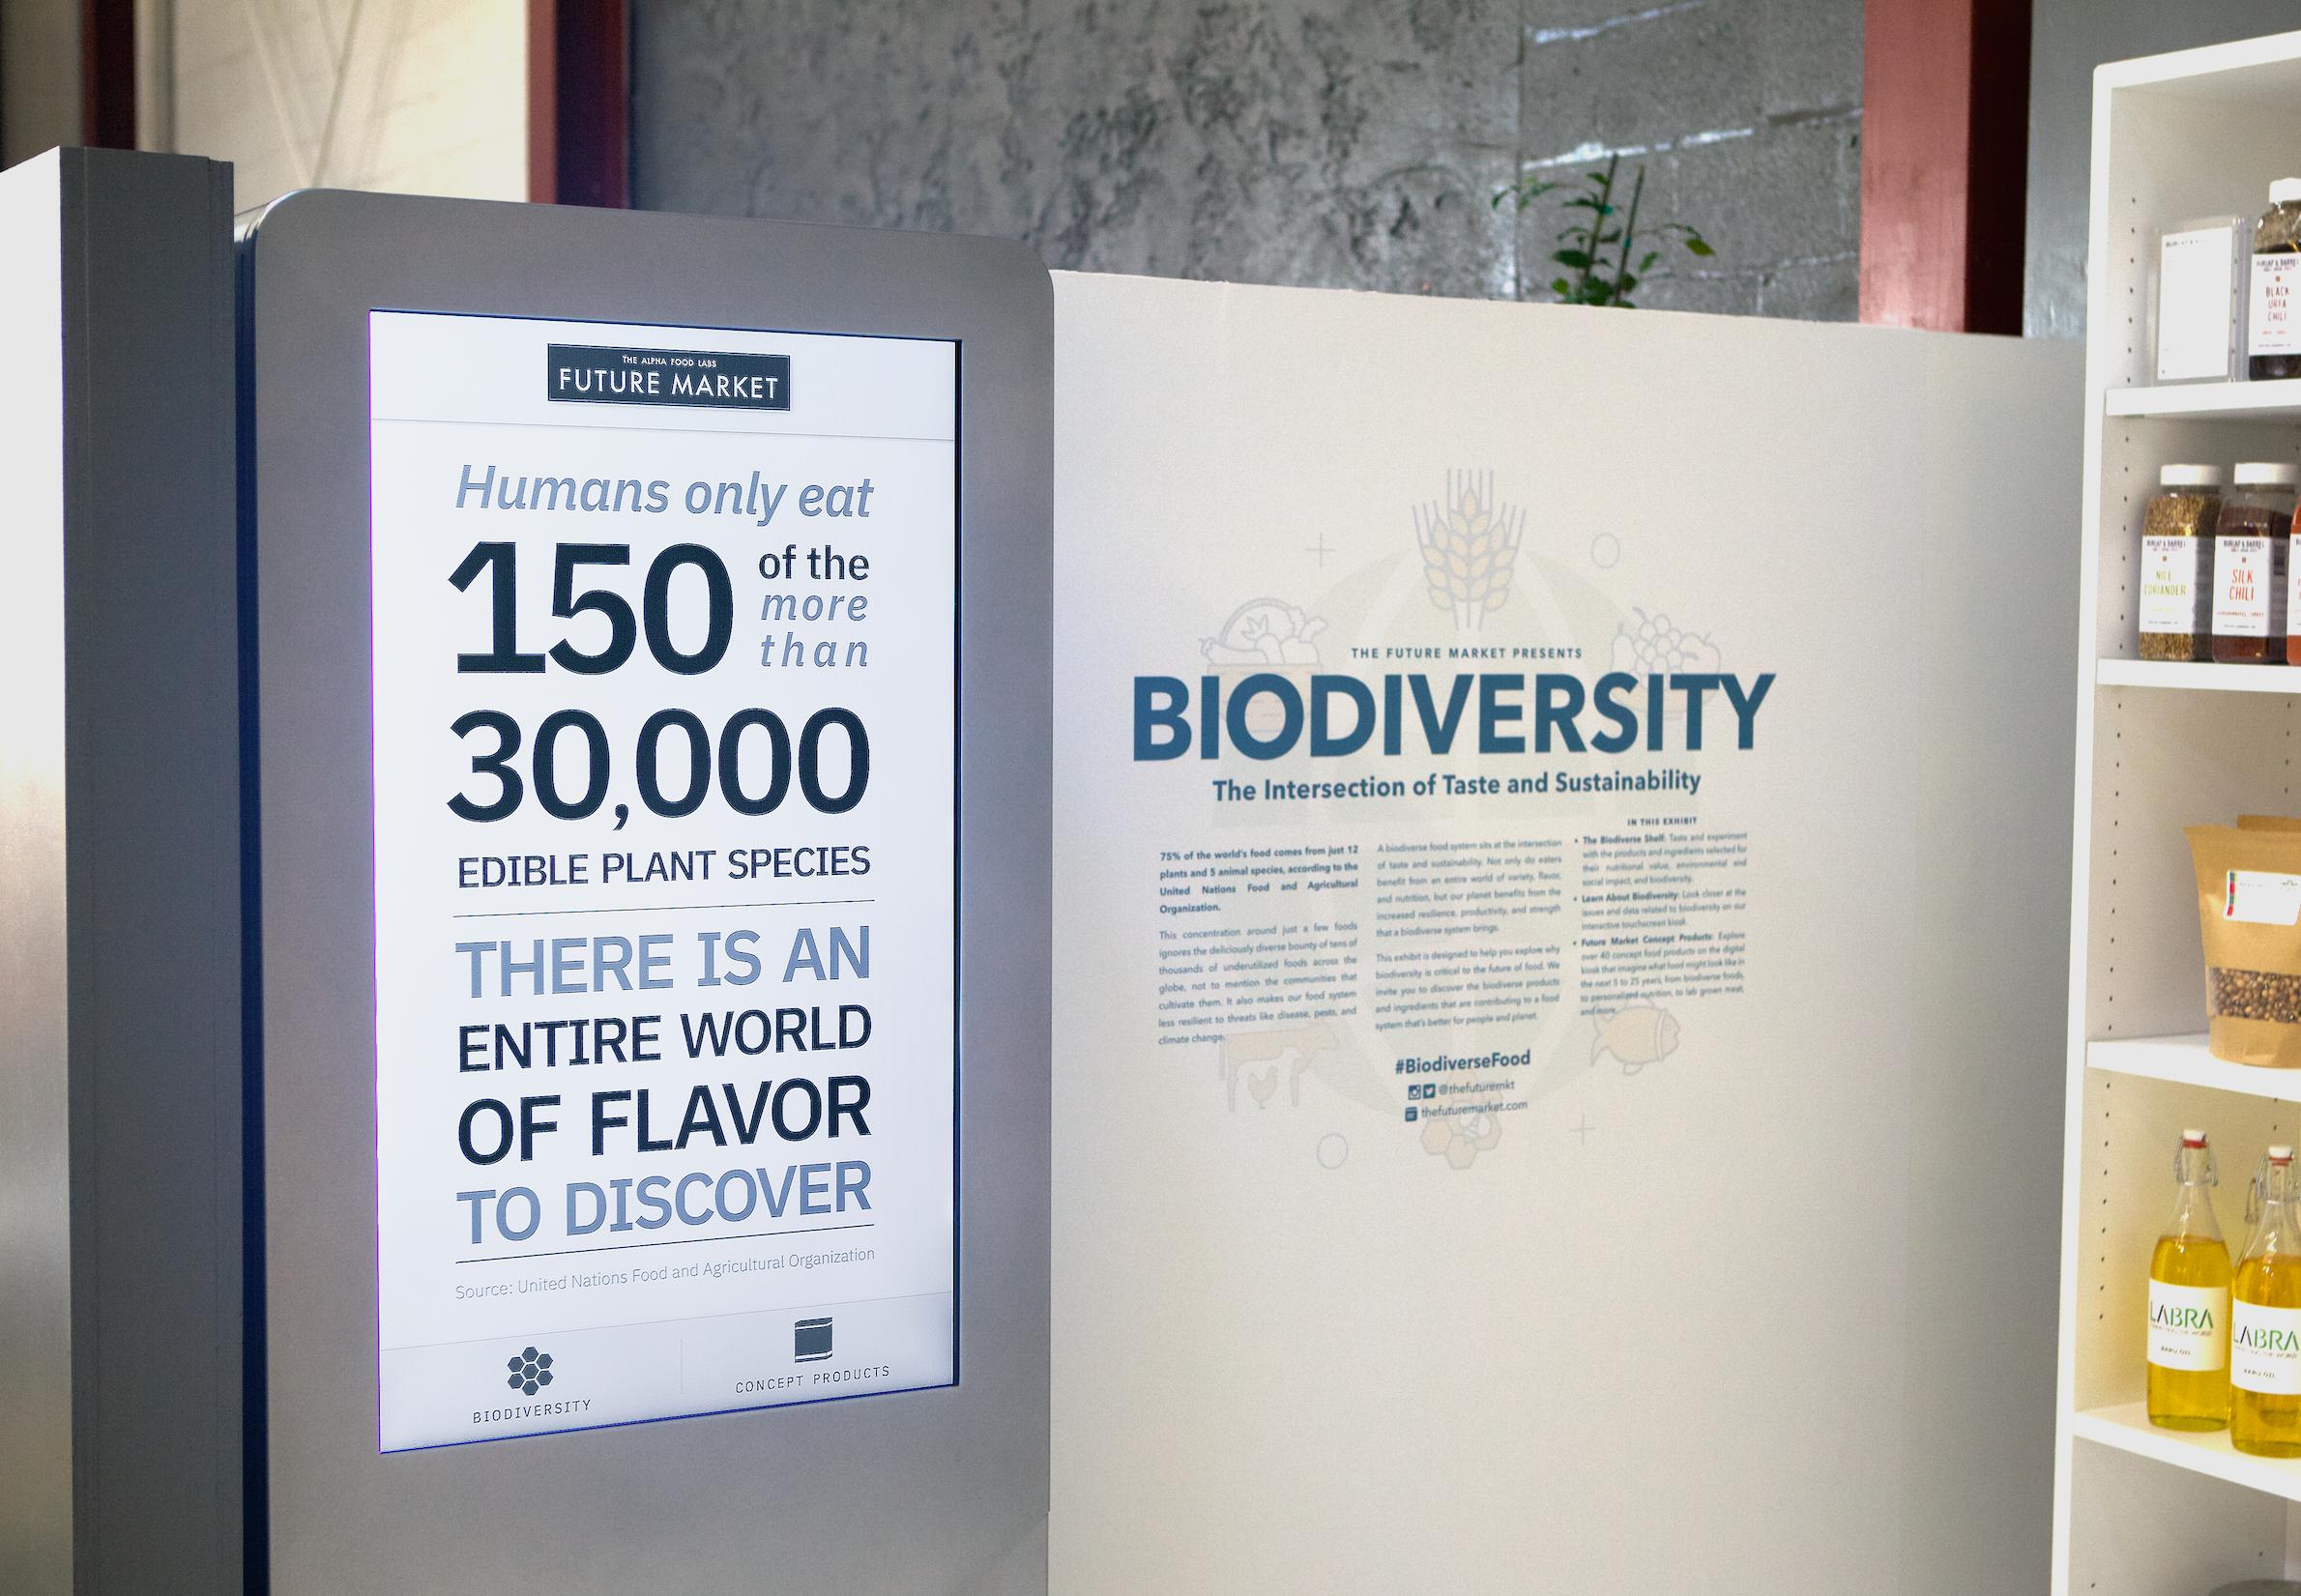 TFM-Biodiversity_03.png